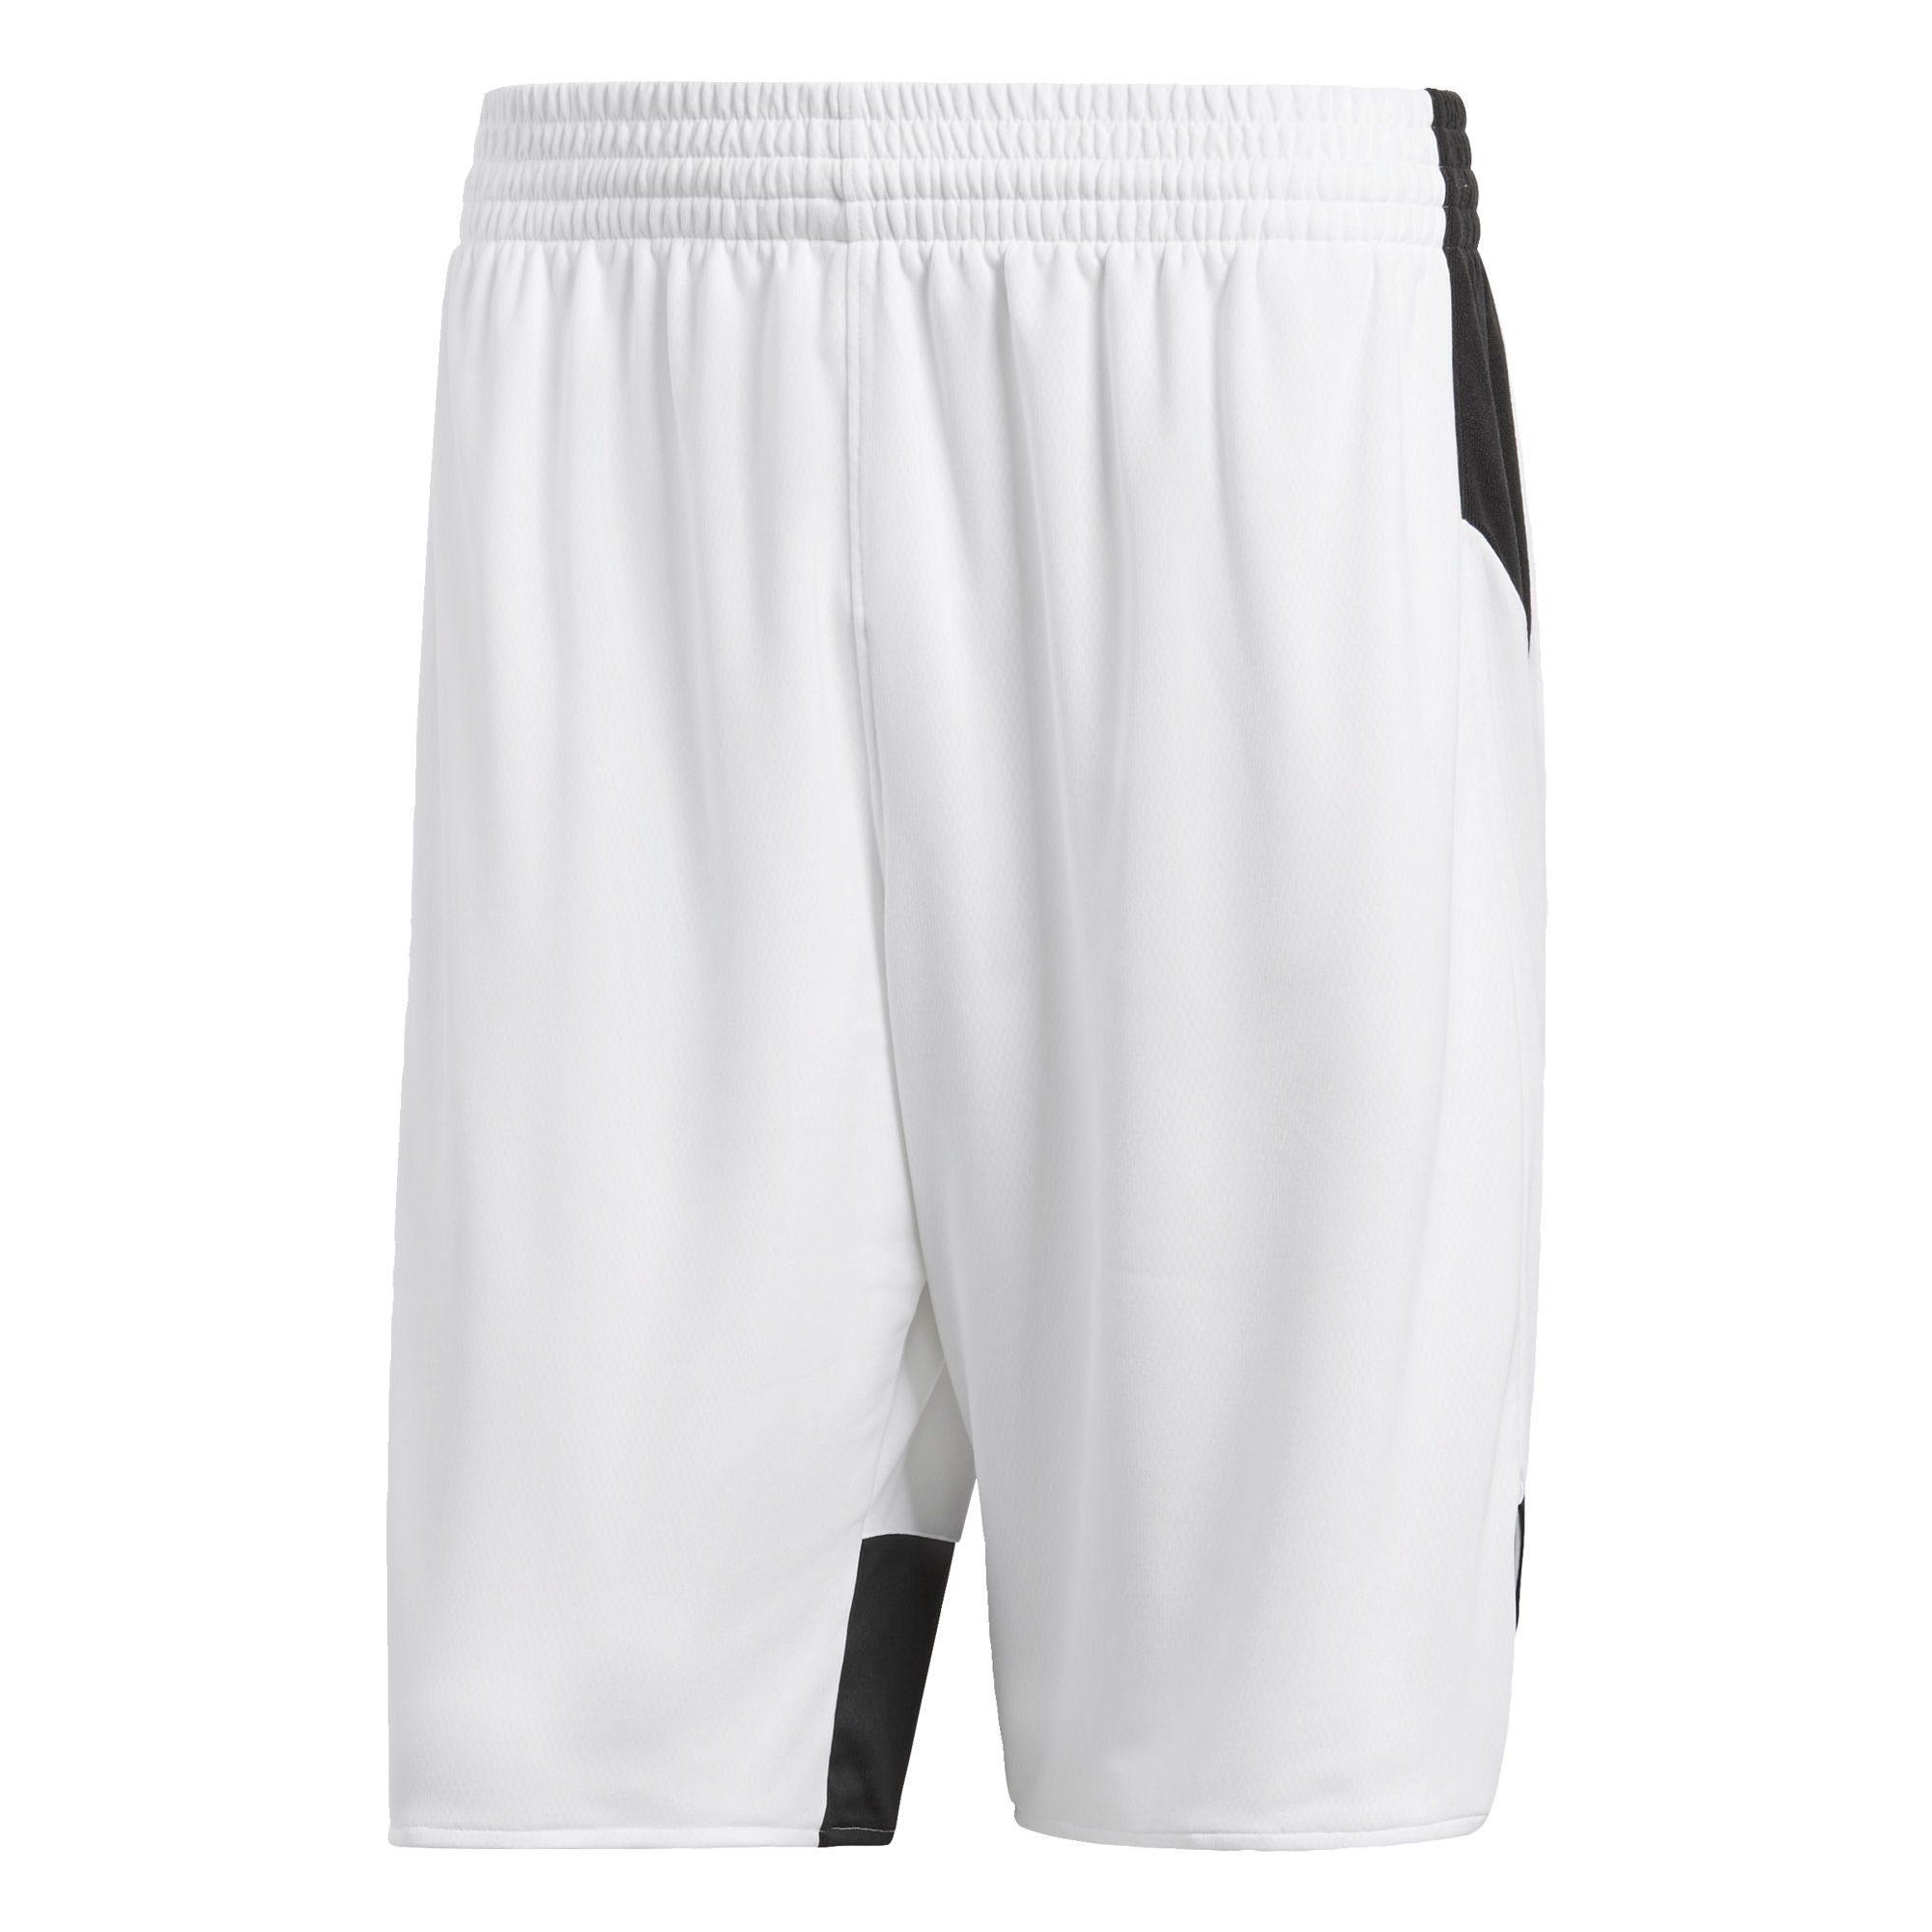 adidas Performance Shorts »Crazy Explosive Shorts« Teambekleidung online kaufen   OTTO